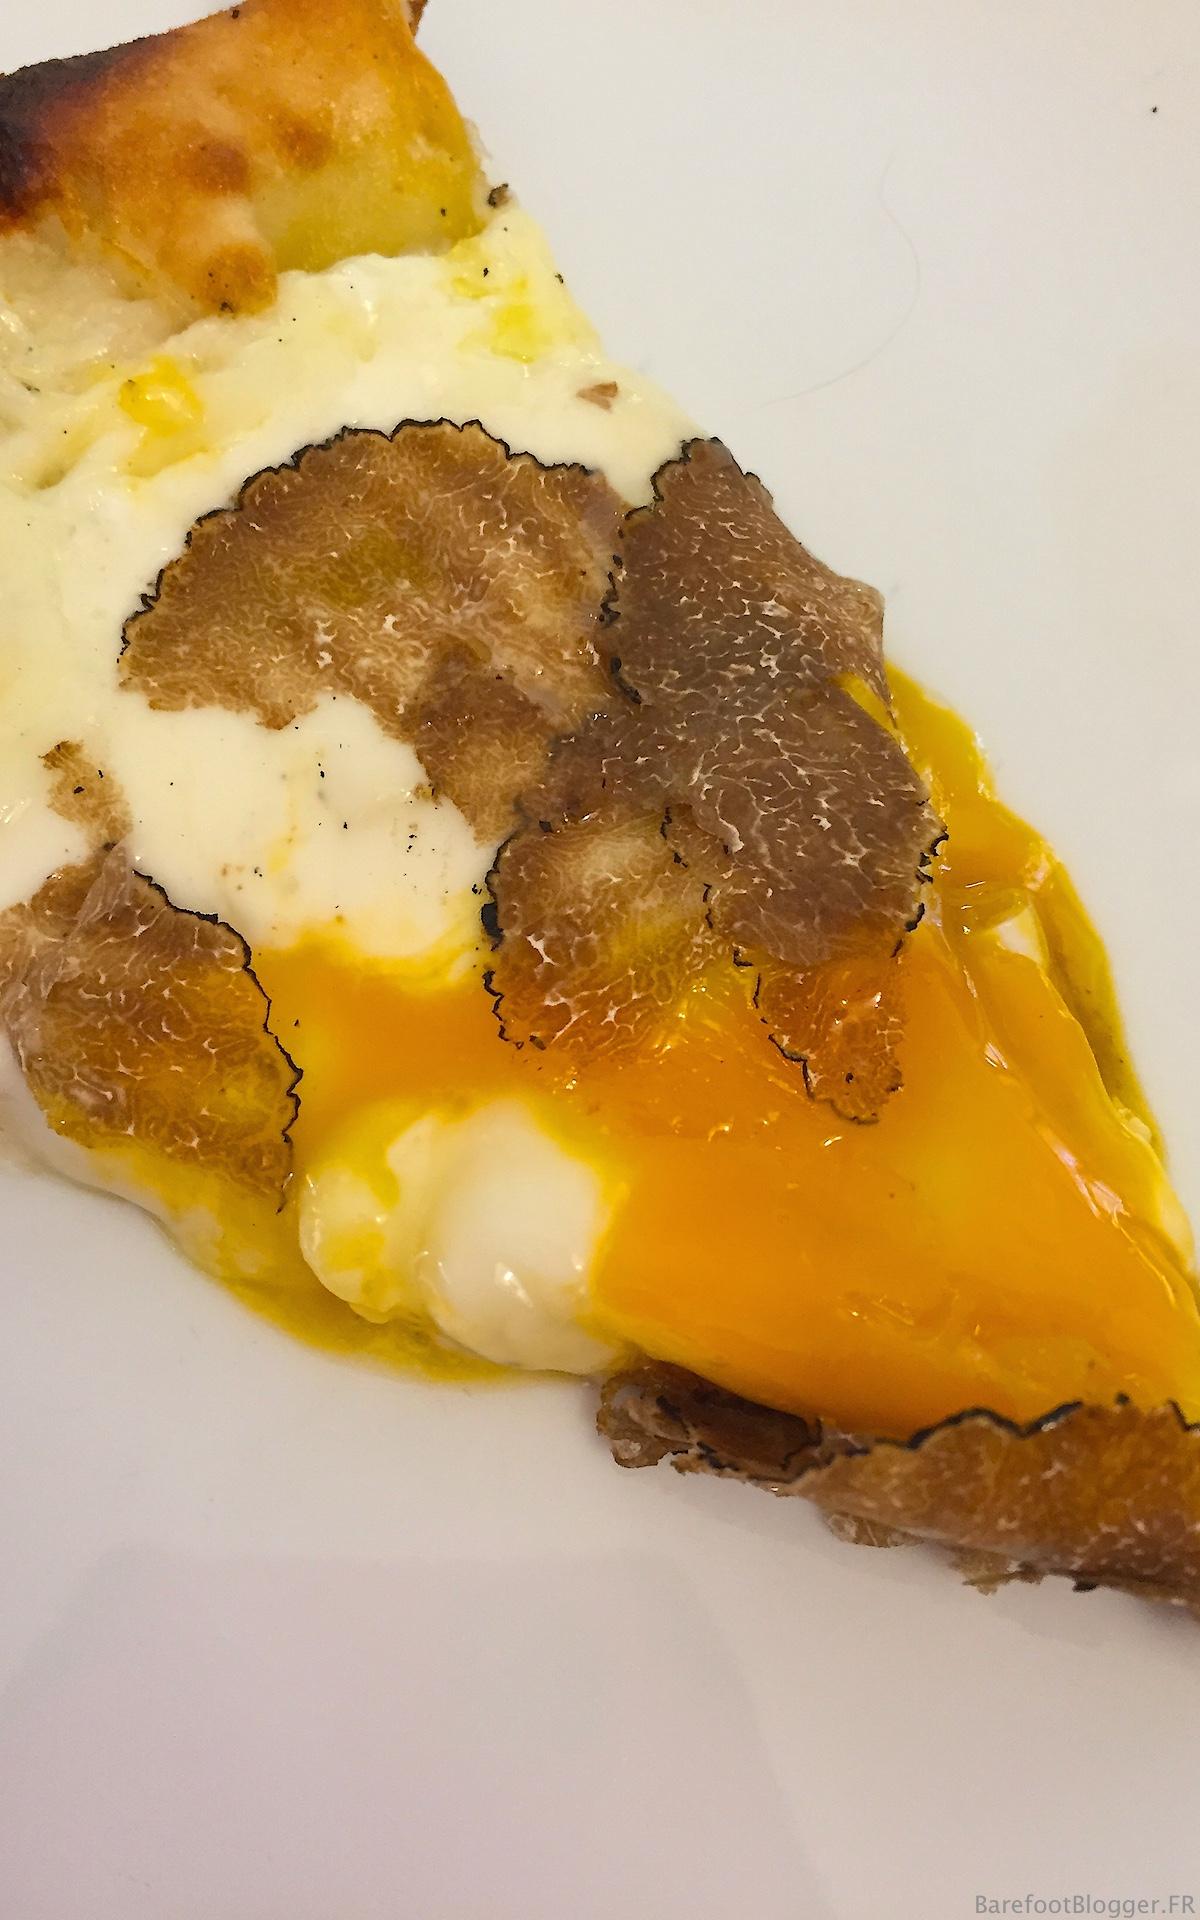 Mystical, Magical Truffles: Alba's White Truffle Festival